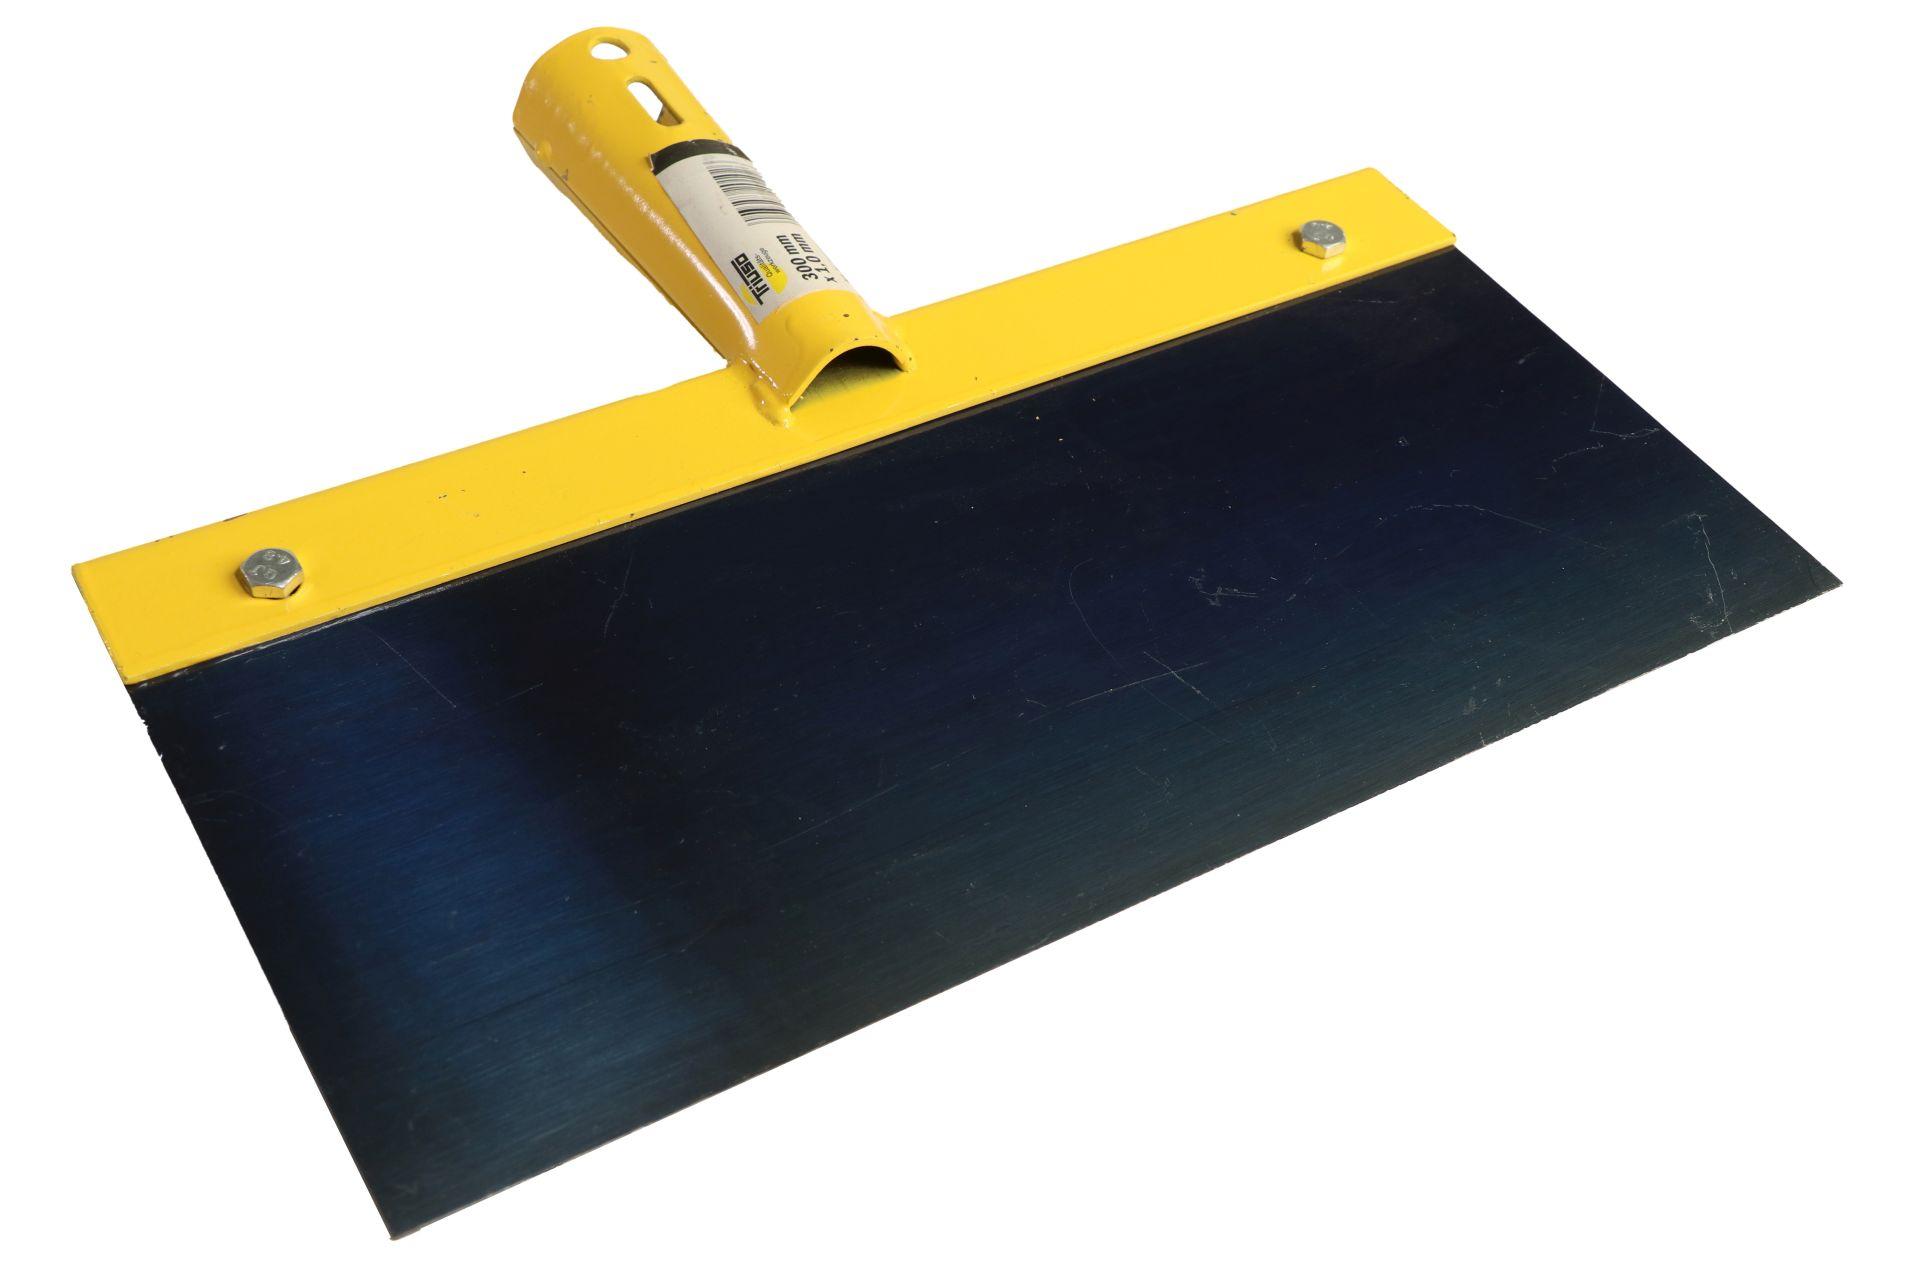 TRIUSO Federstahl-Stoßscharre, 1 x 300 mm, ohne Stiel